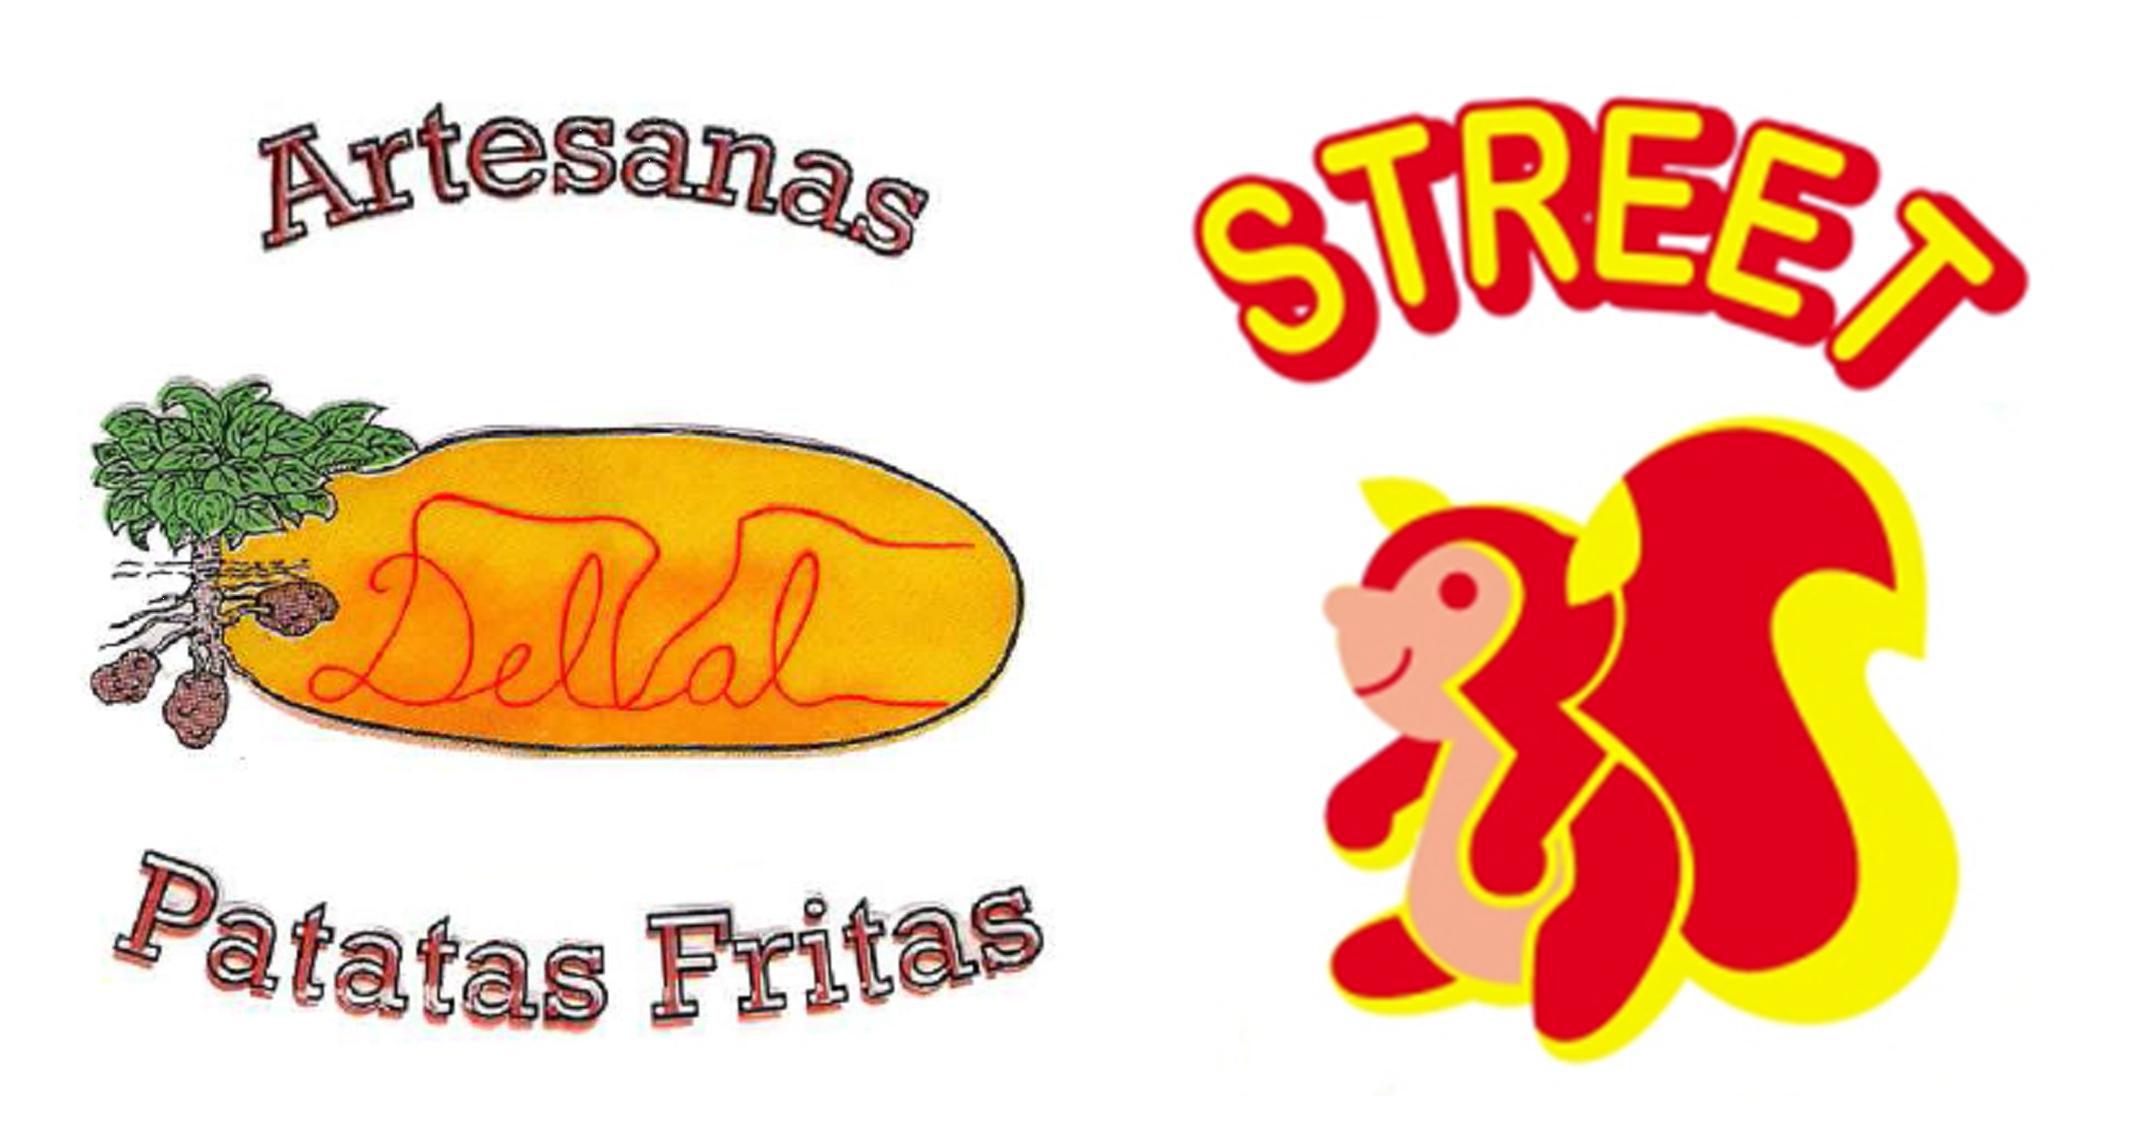 Frutos Secos Street